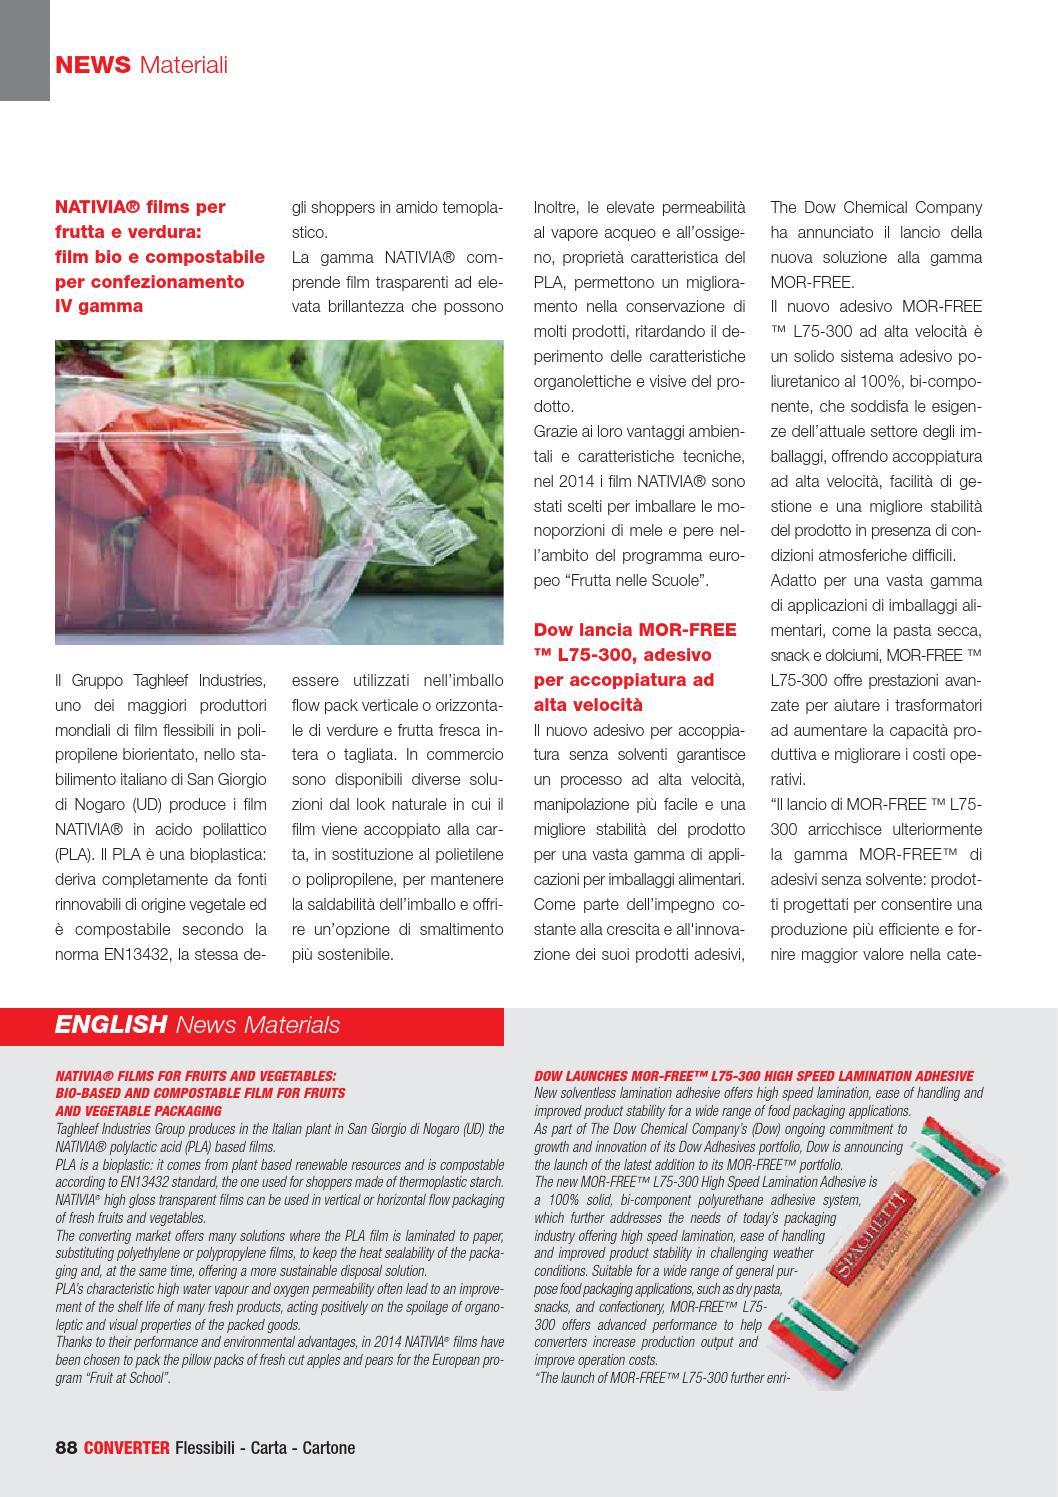 Converter-Flessibili-Carta-Cartone january/february 2016 by